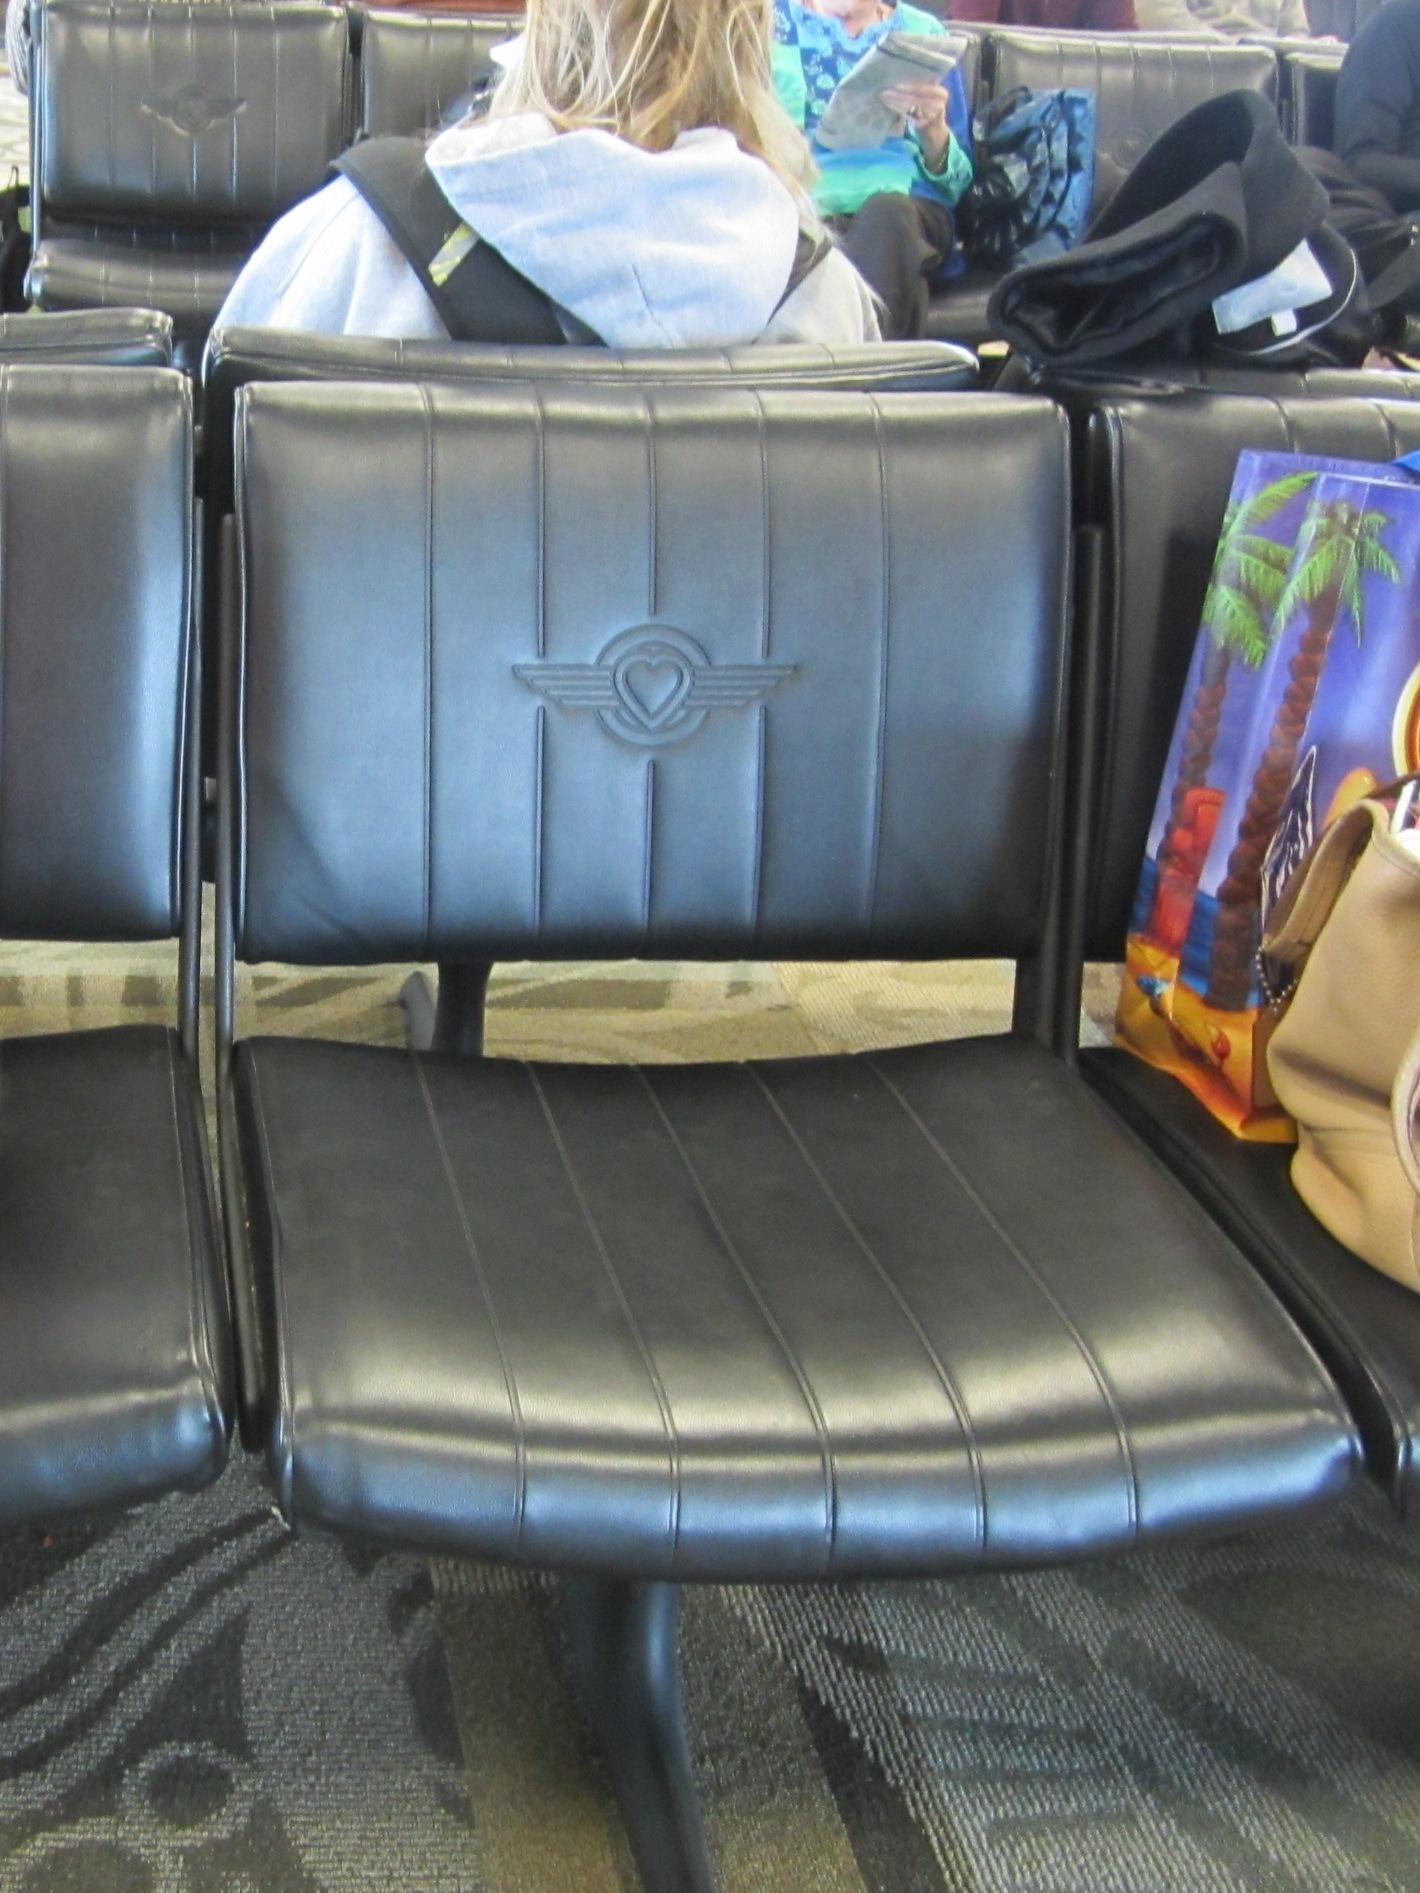 Southwestのロゴ入りの椅子(フロリダFt. Lauderdale空港にて)